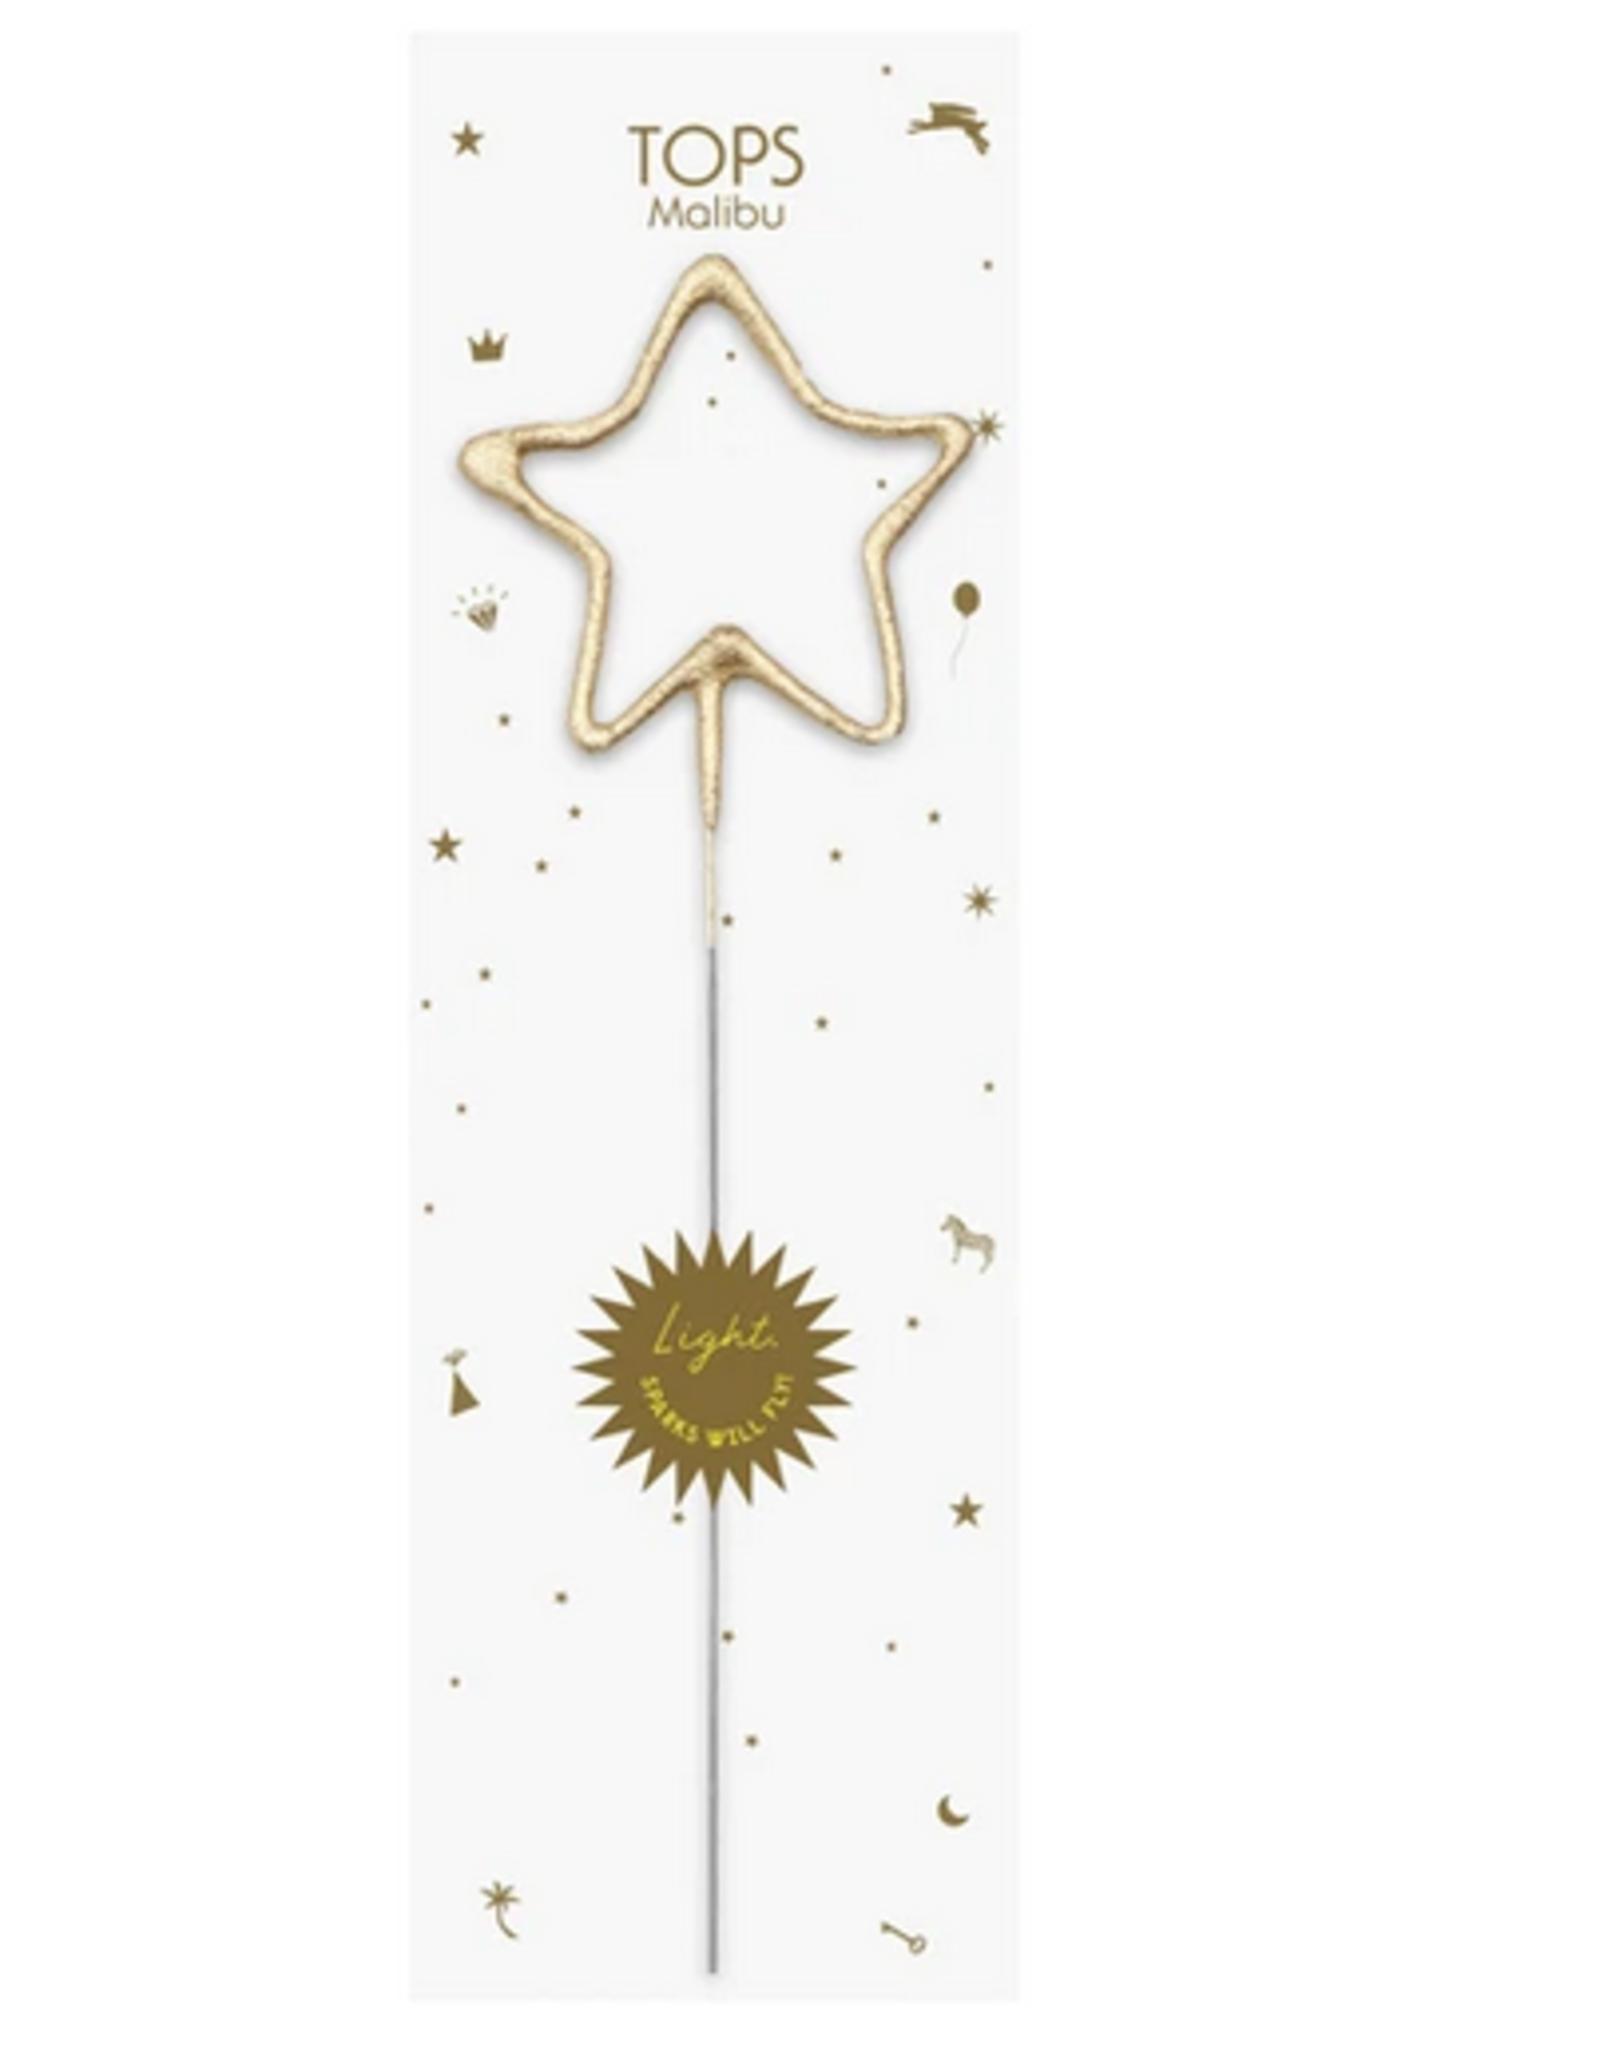 TOPS Malibu Big Golden Sparkler Wand Star